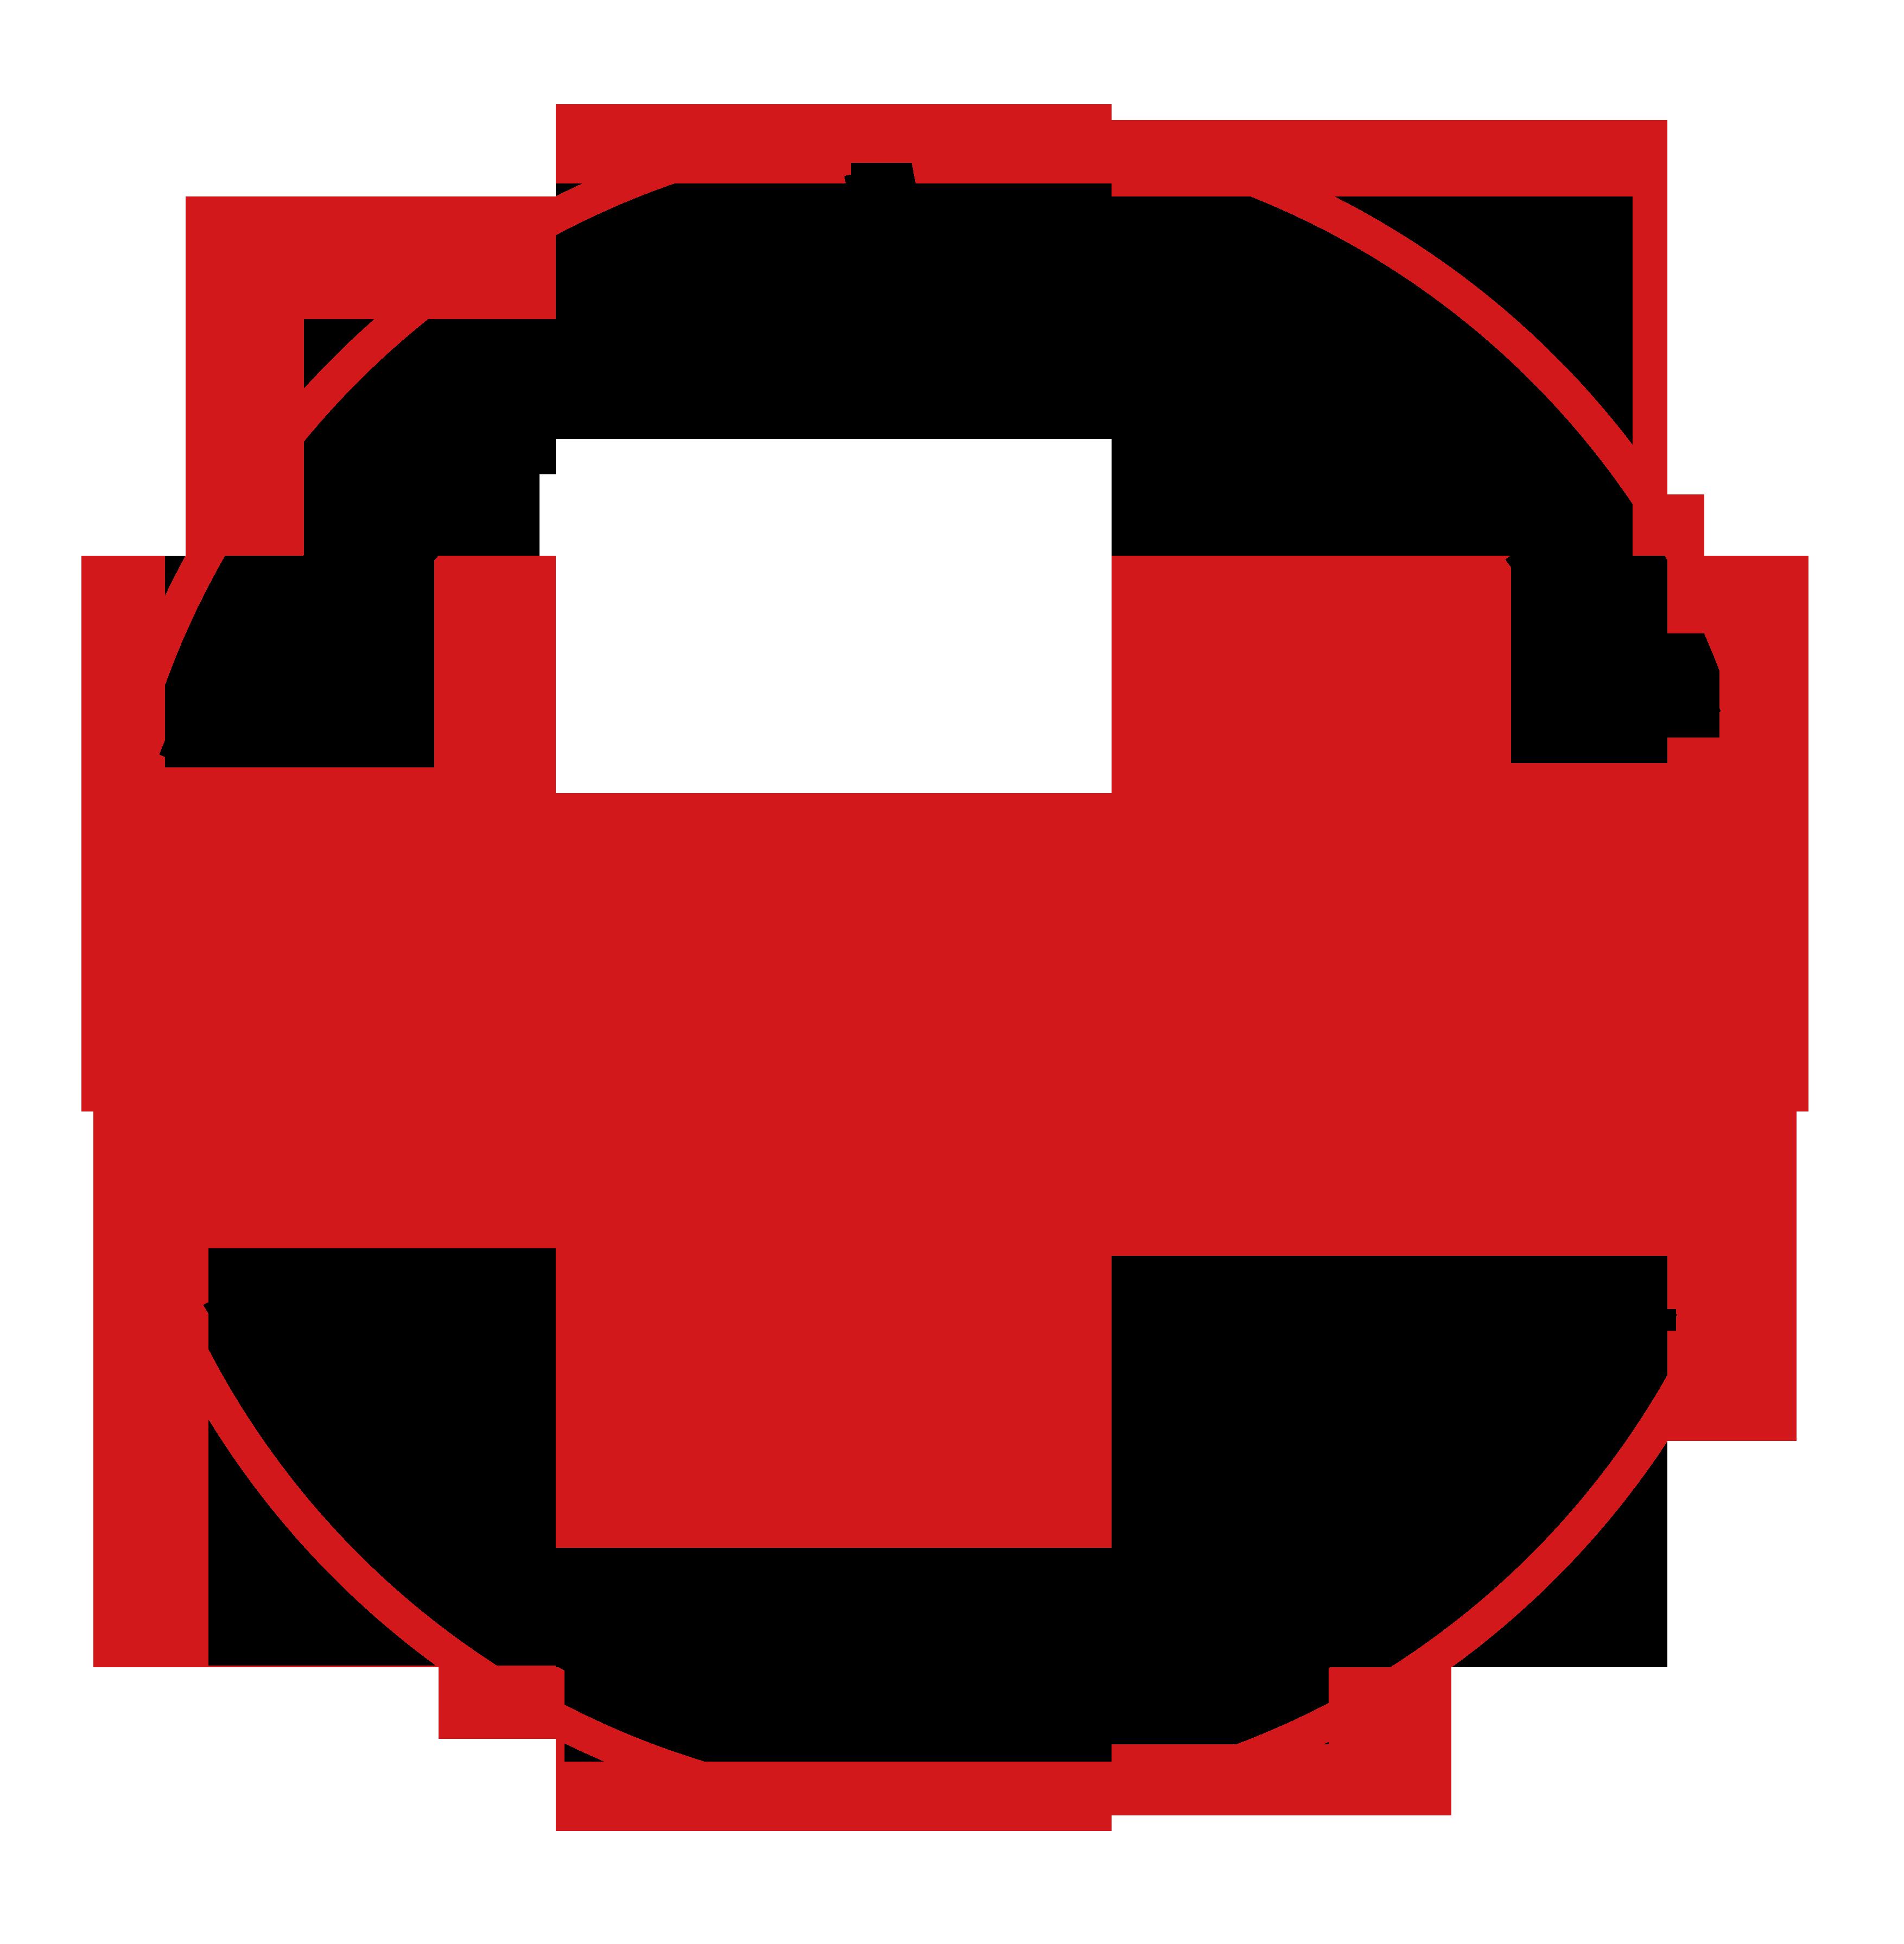 HFS Fussballschule